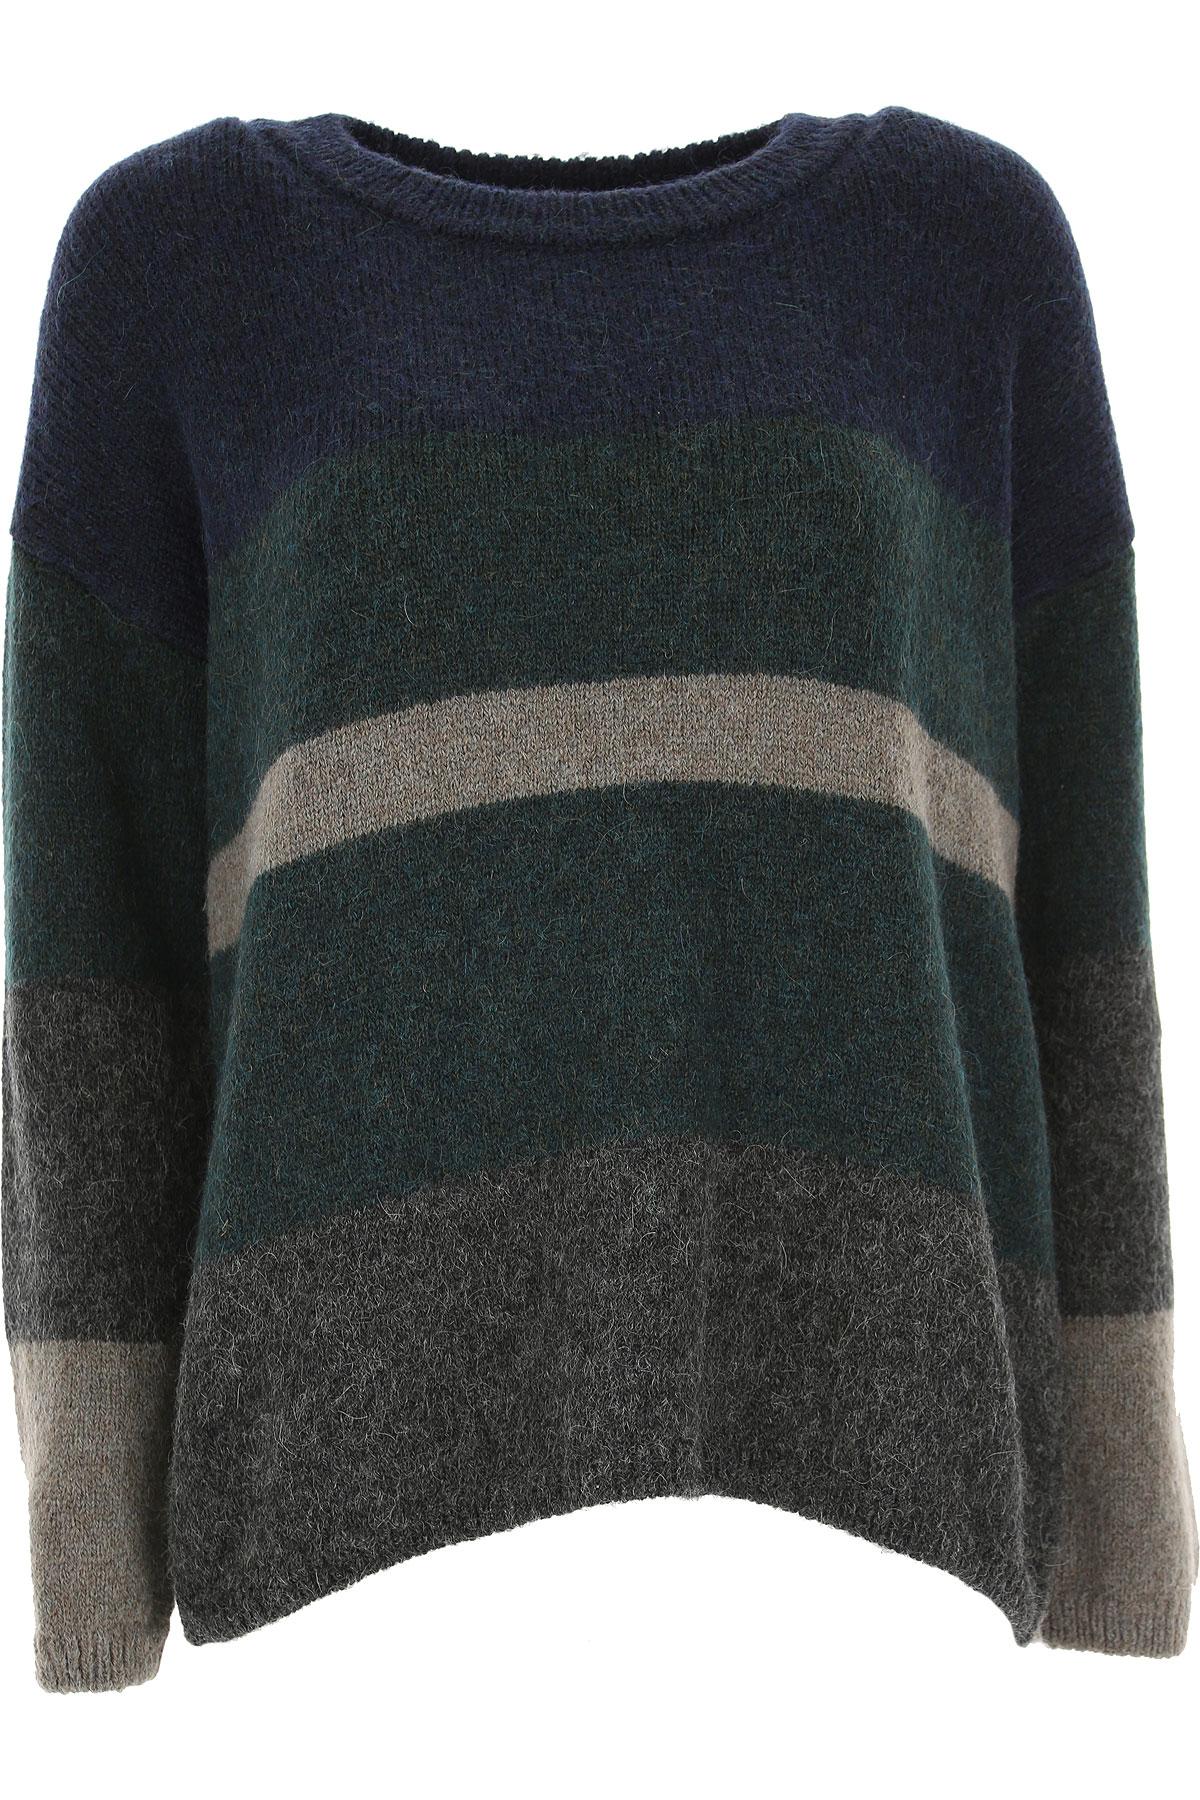 Image of Massimo Alba Sweater for Women Jumper, Dark Blue, alpaca, 2017, 6 8